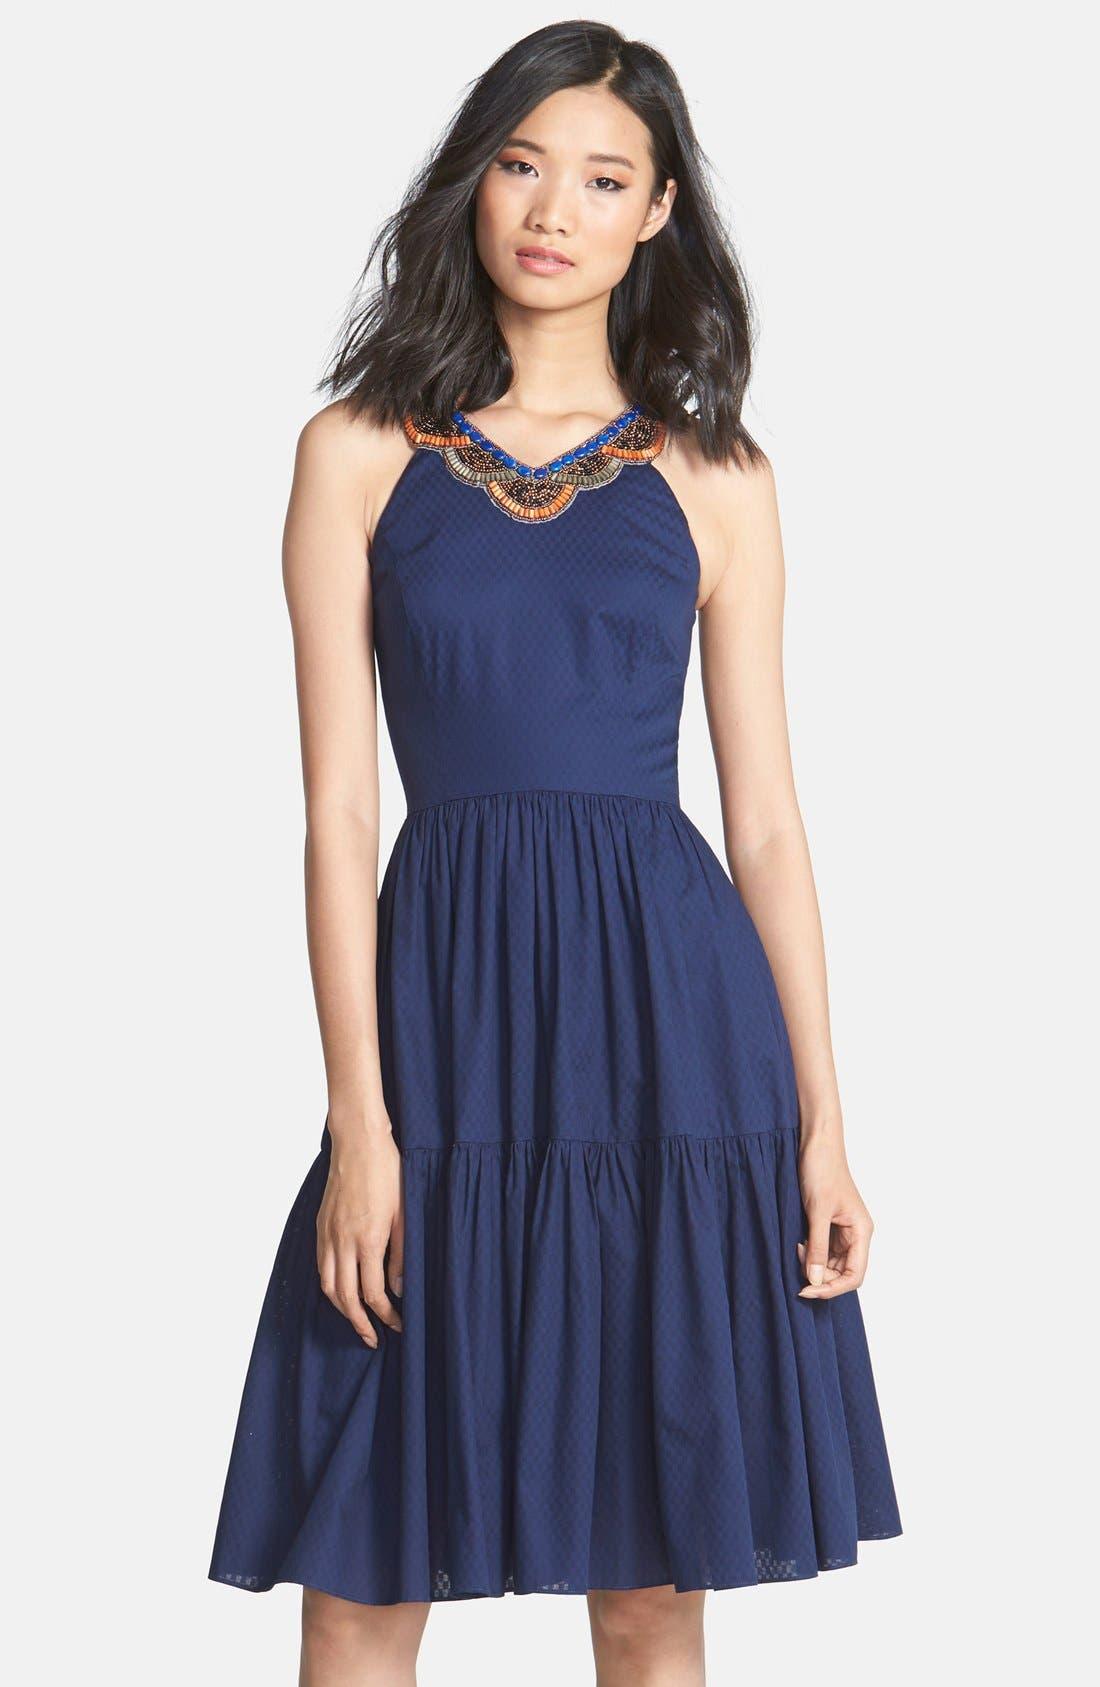 Main Image - Cynthia Steffe 'Jett' Embellished Tiered Jacquard Midi Dress